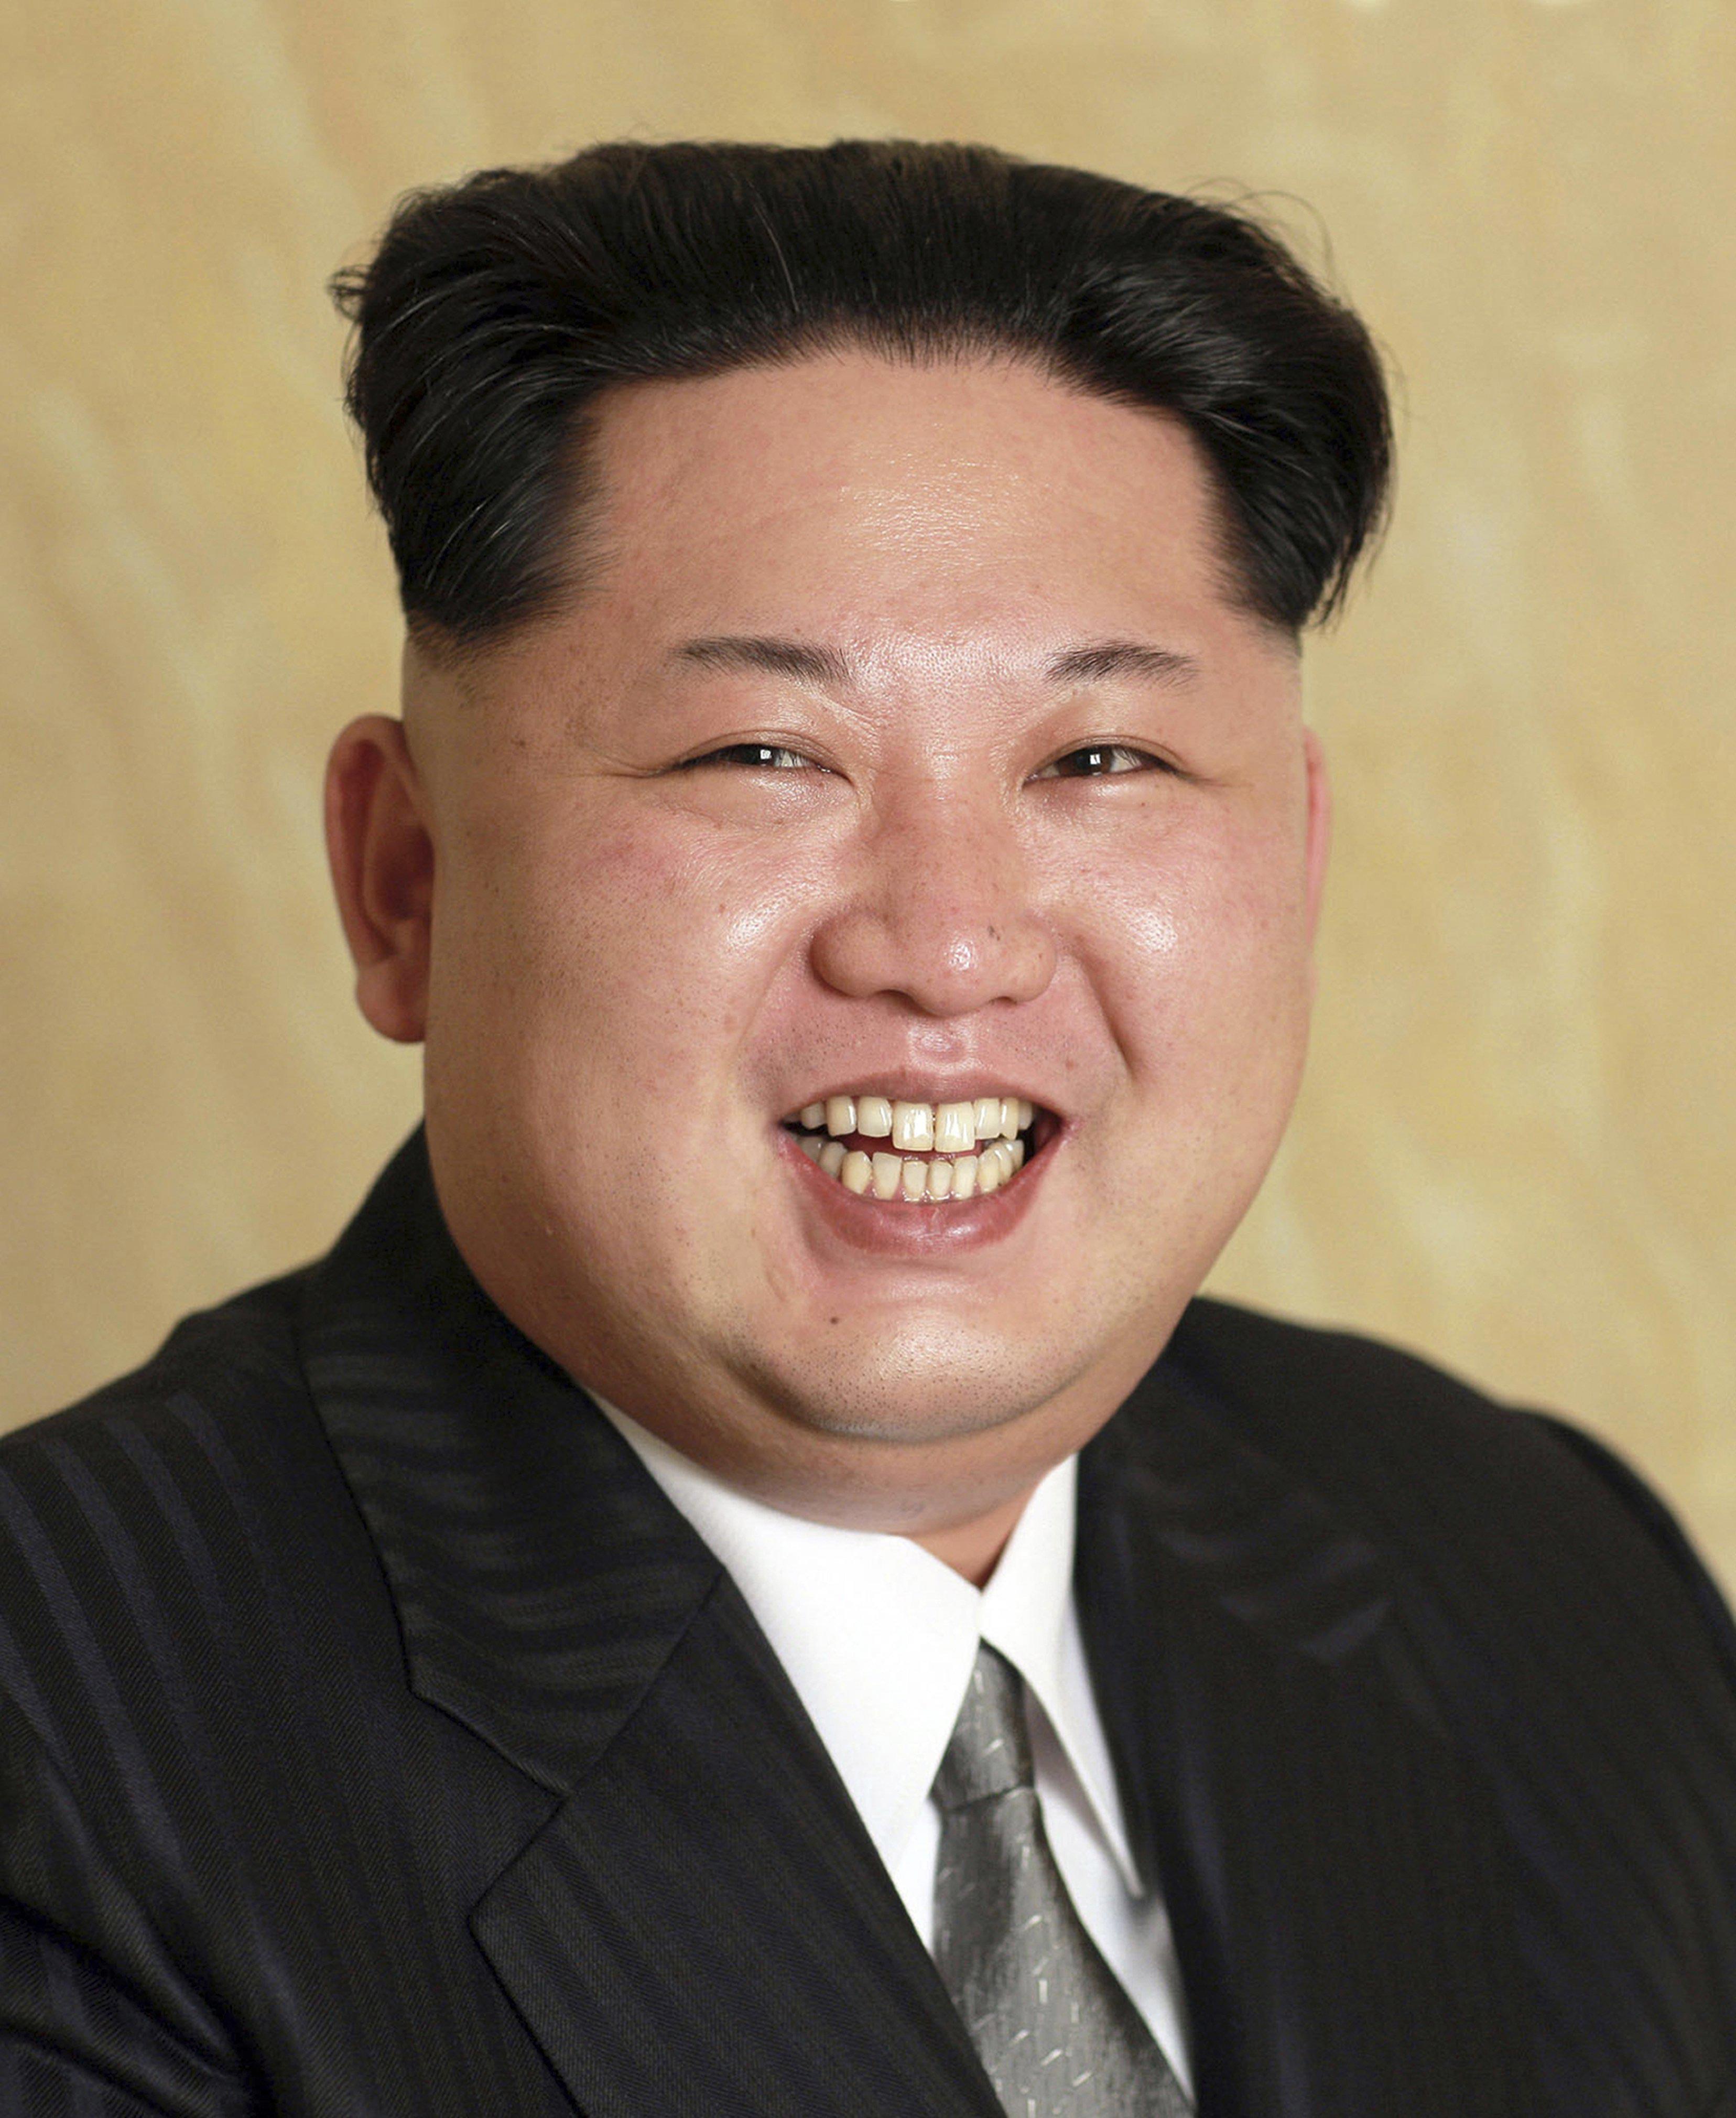 смешное про корейцев картинки фото руководство смогло устоять